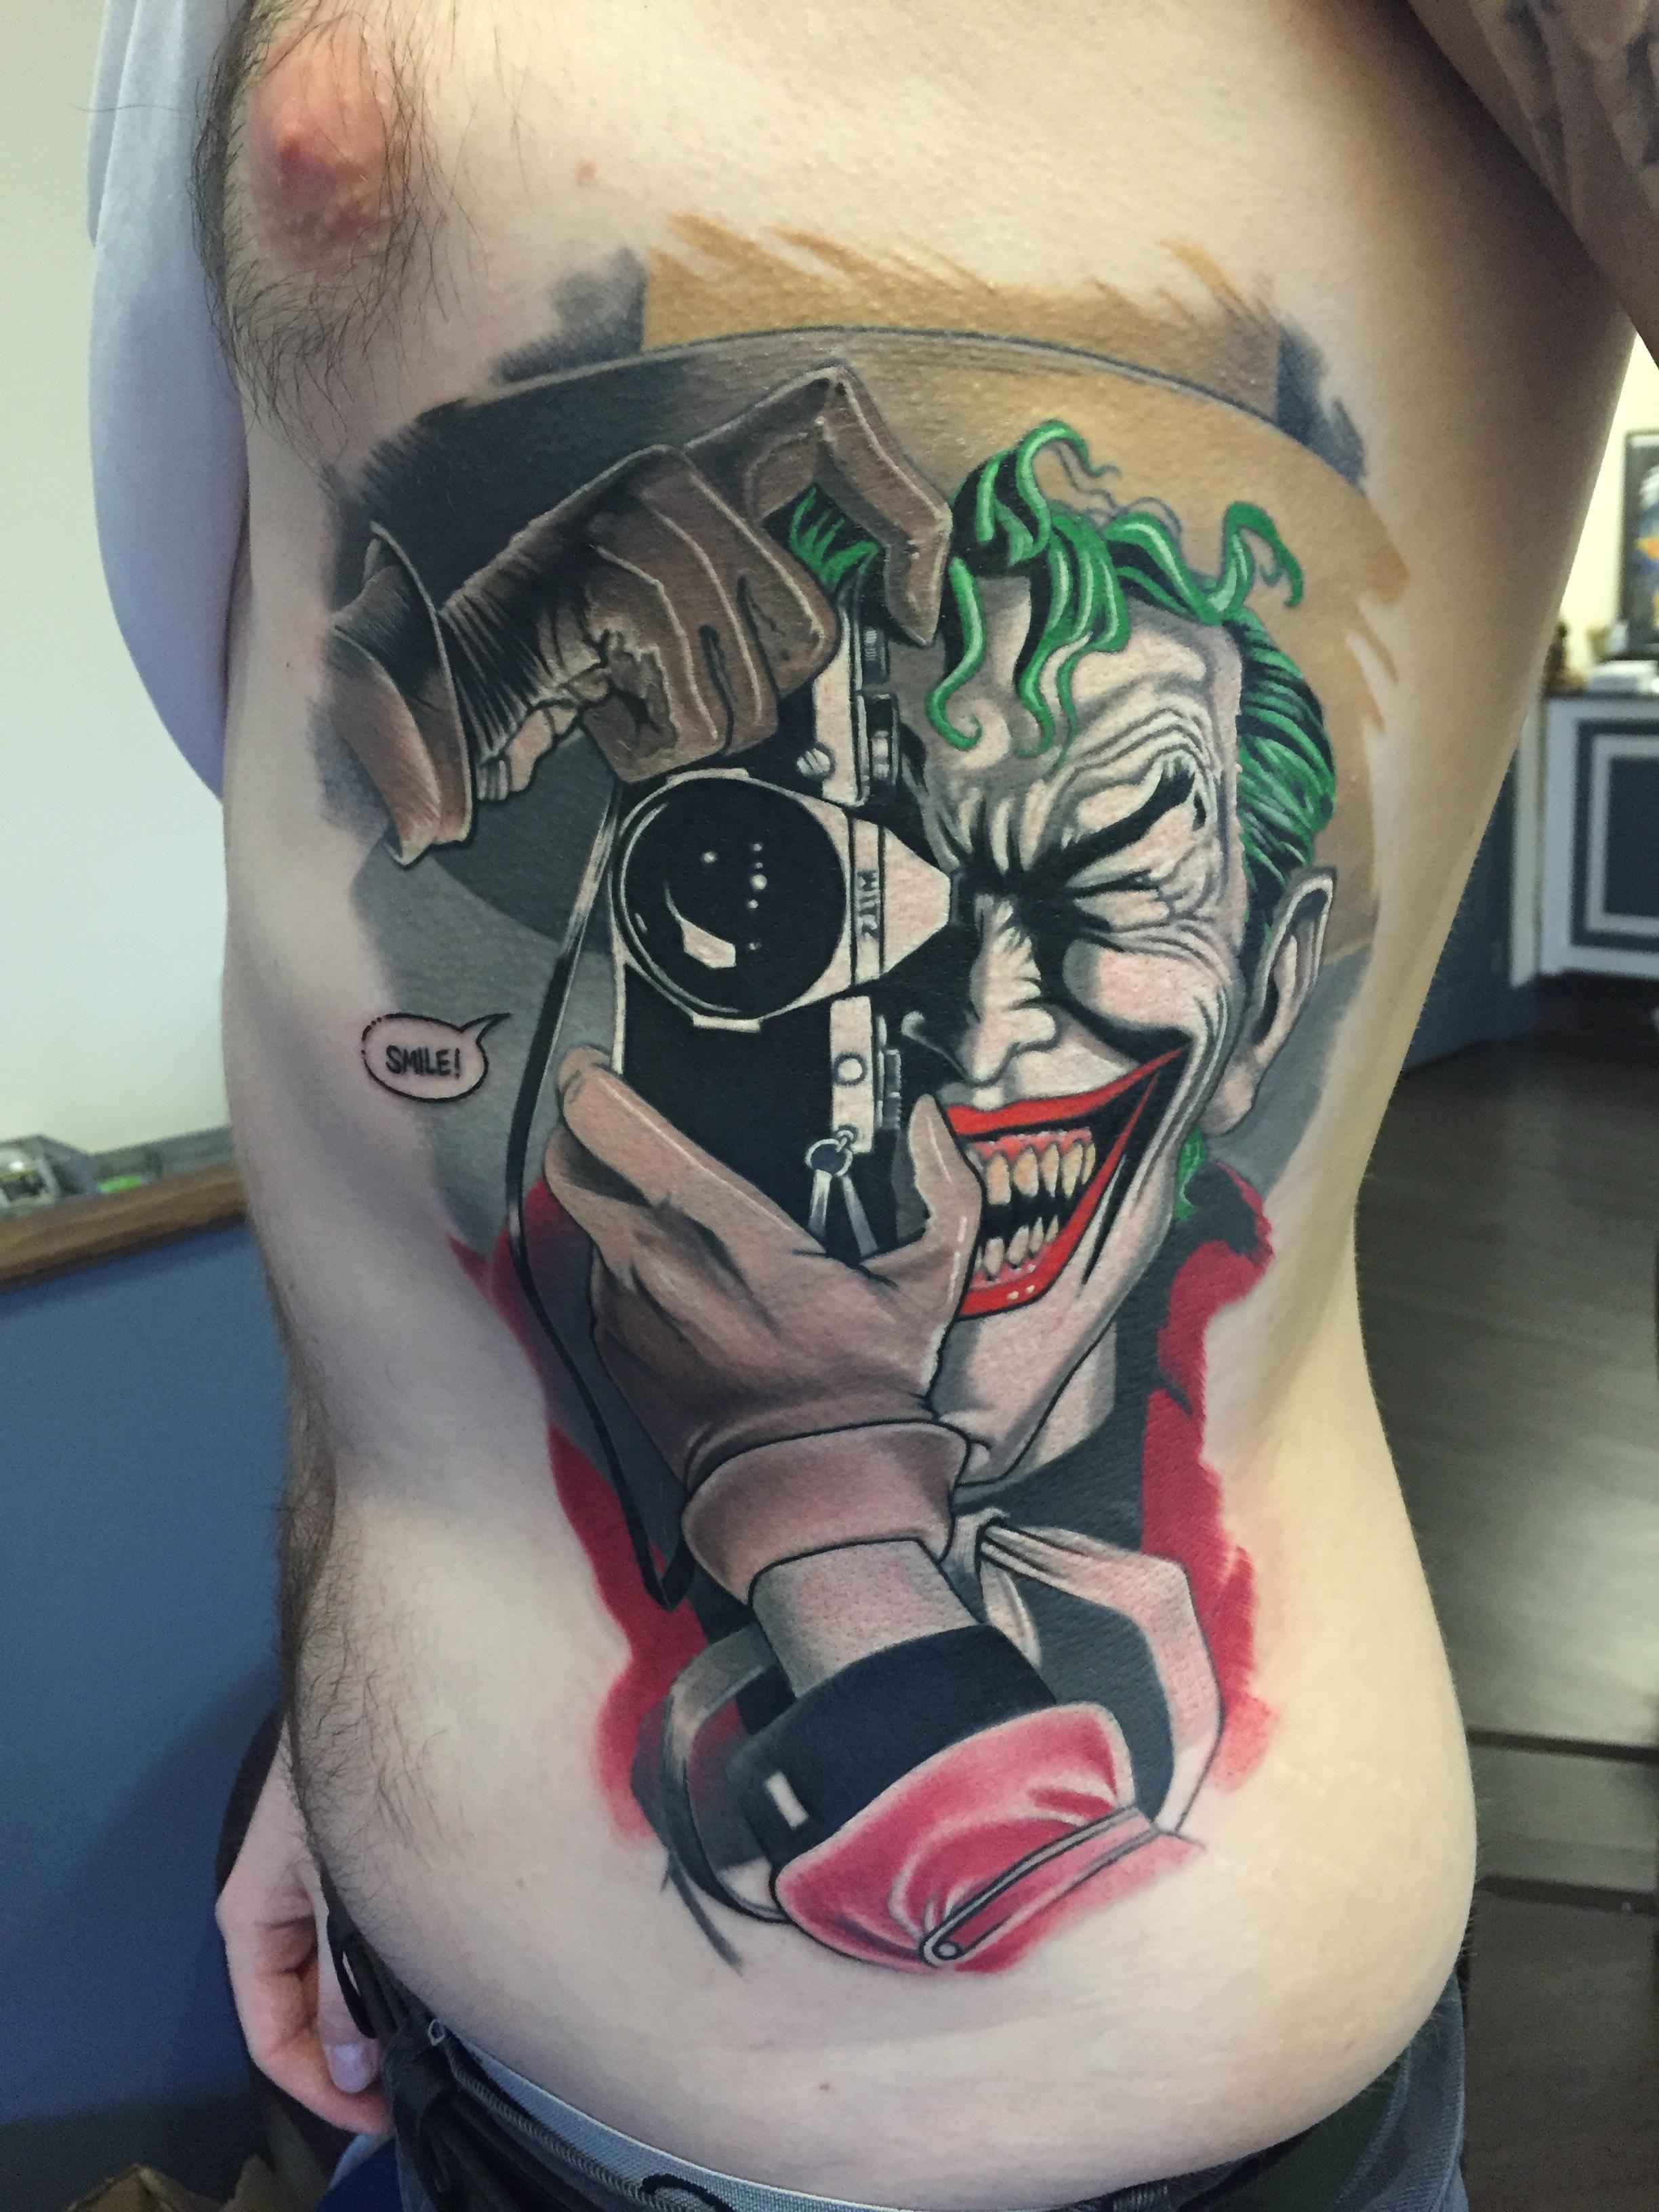 New joker tattoo by polish dan at true colour york uk for Clean rock one tattoos